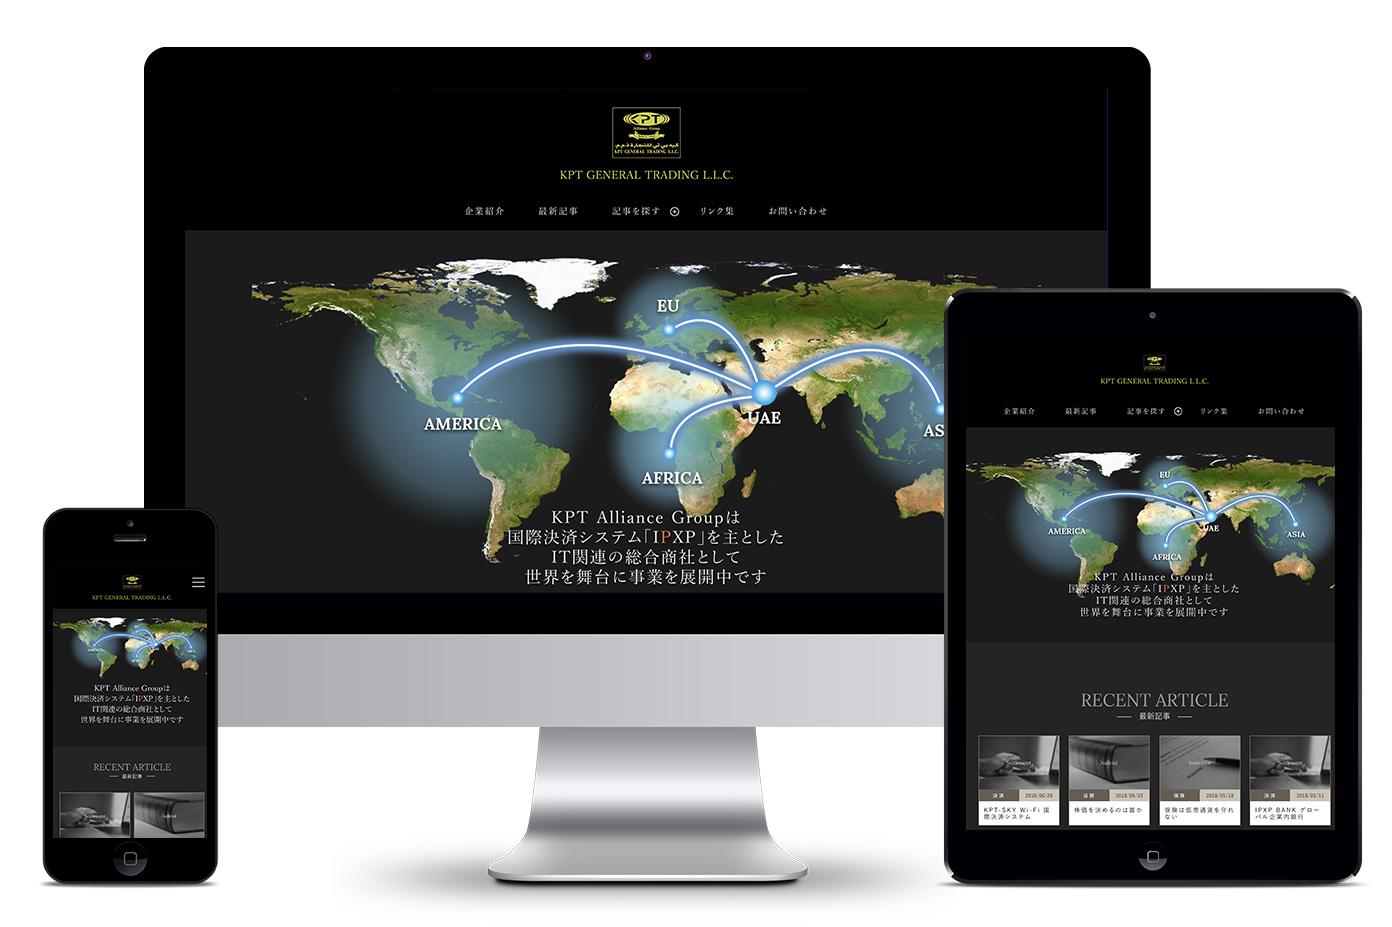 KPT GENERAL TRADING L.L.C.ホームページ制作事例